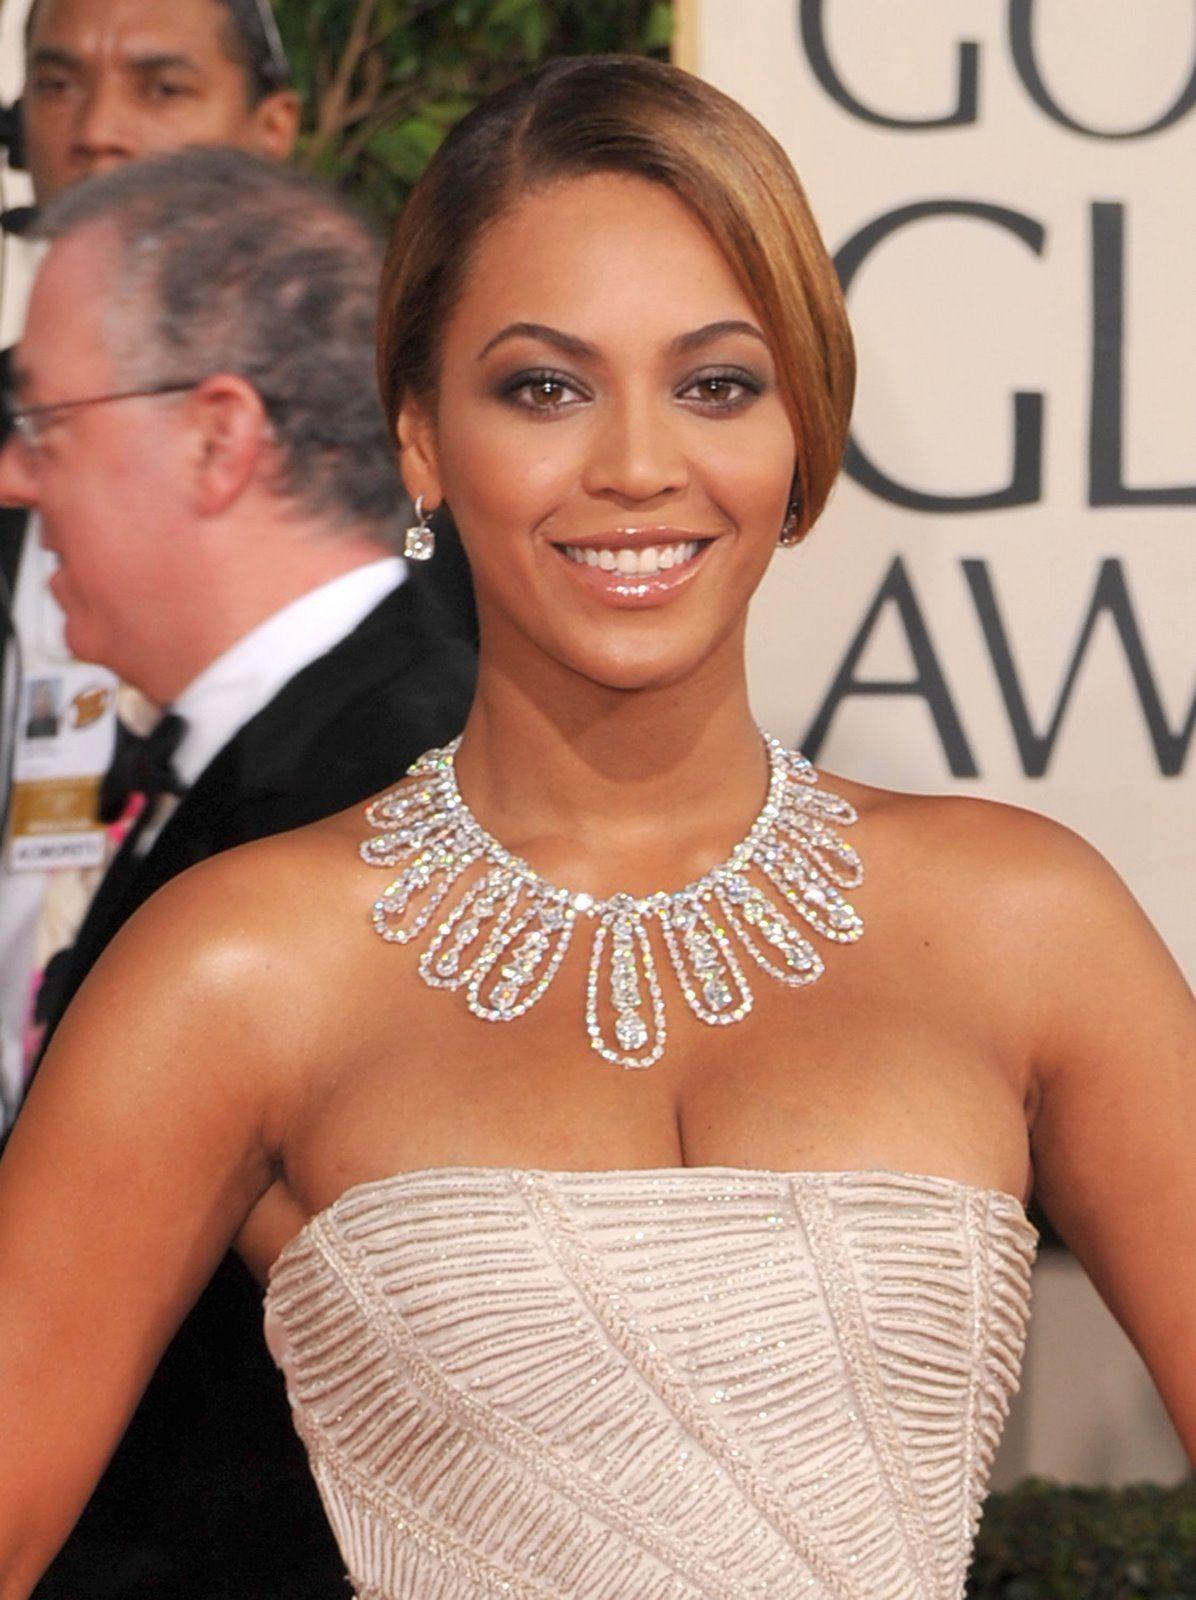 Get the Look for Less - EvesAddiction's Oscar Celebrity ...